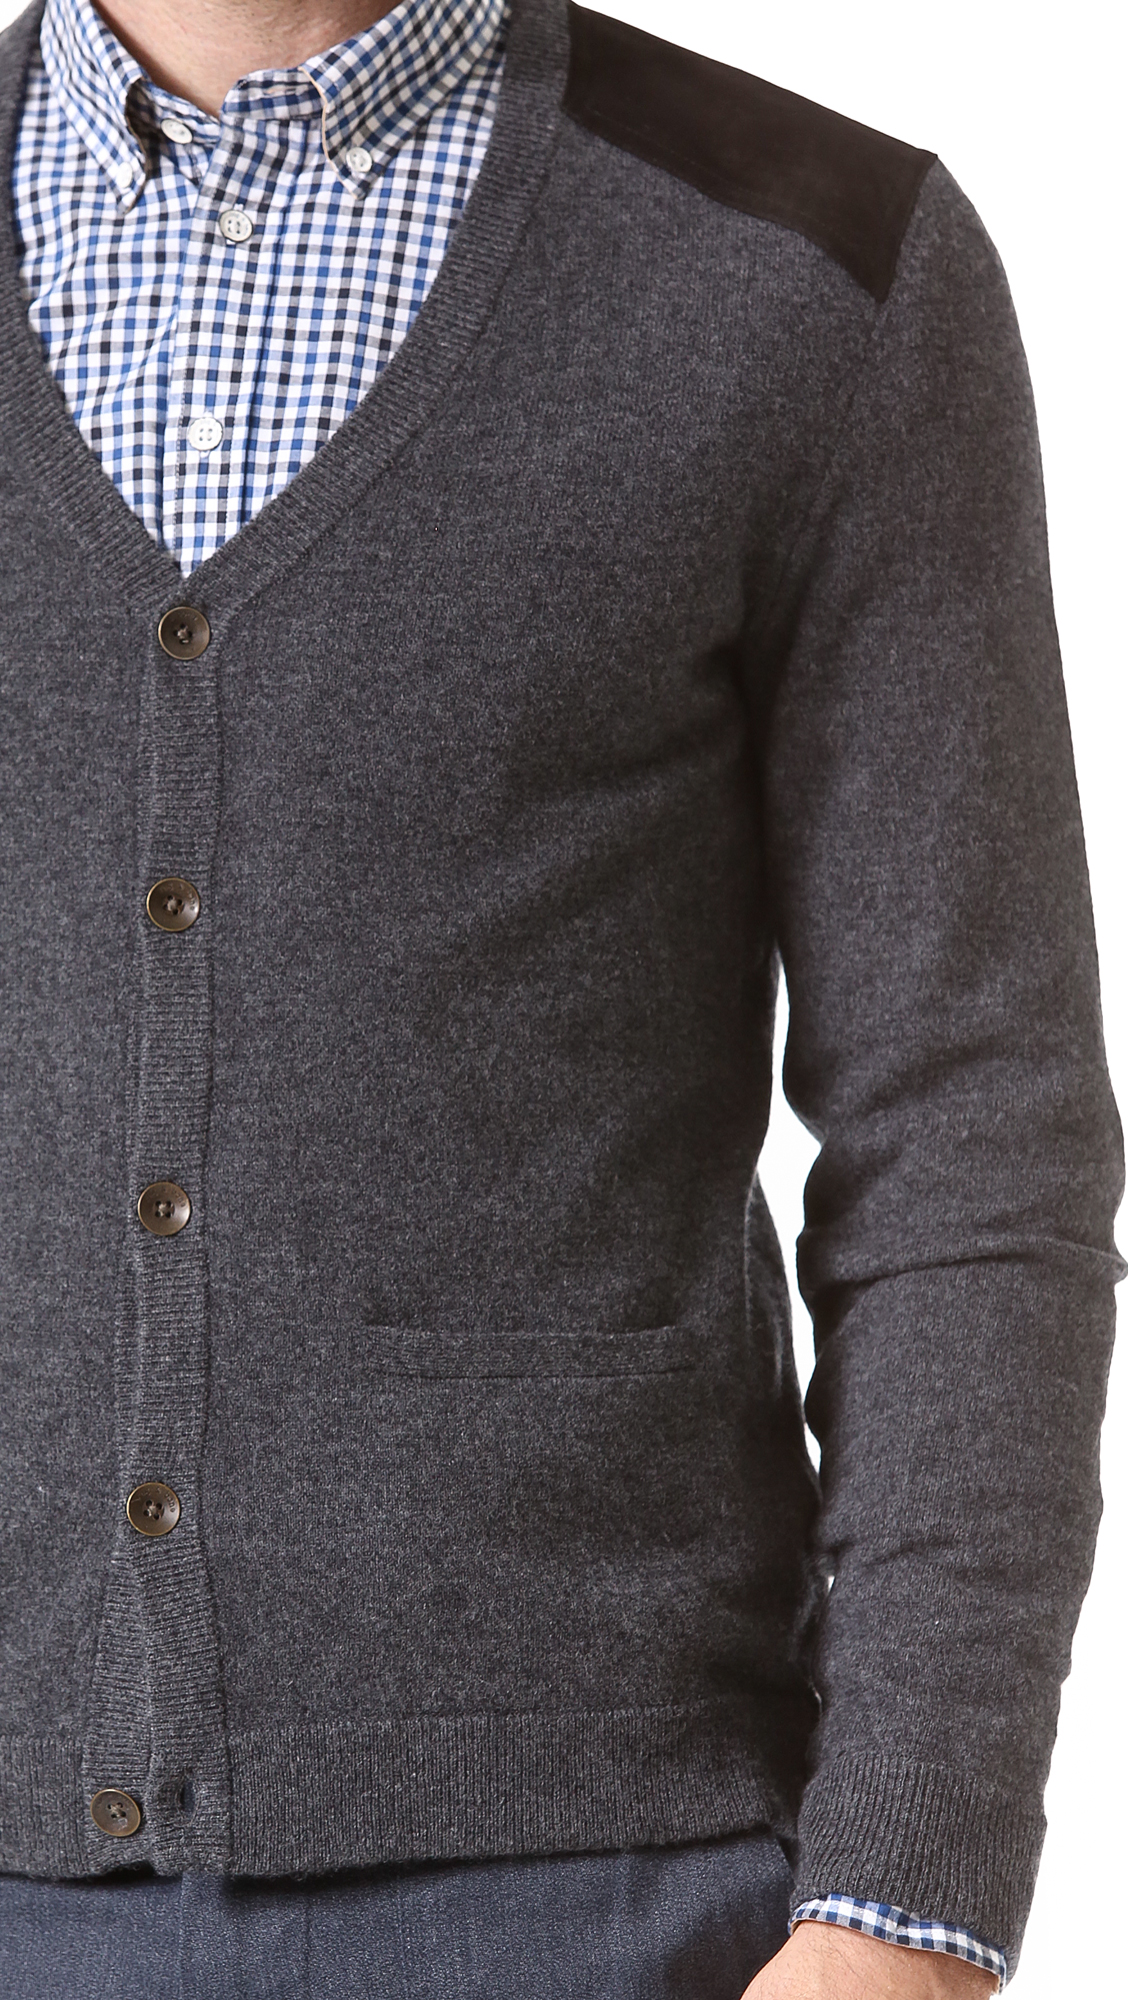 Rag & Bone Zeeland Cardigan with Leather Trim in Charcoal (Grey) for Men